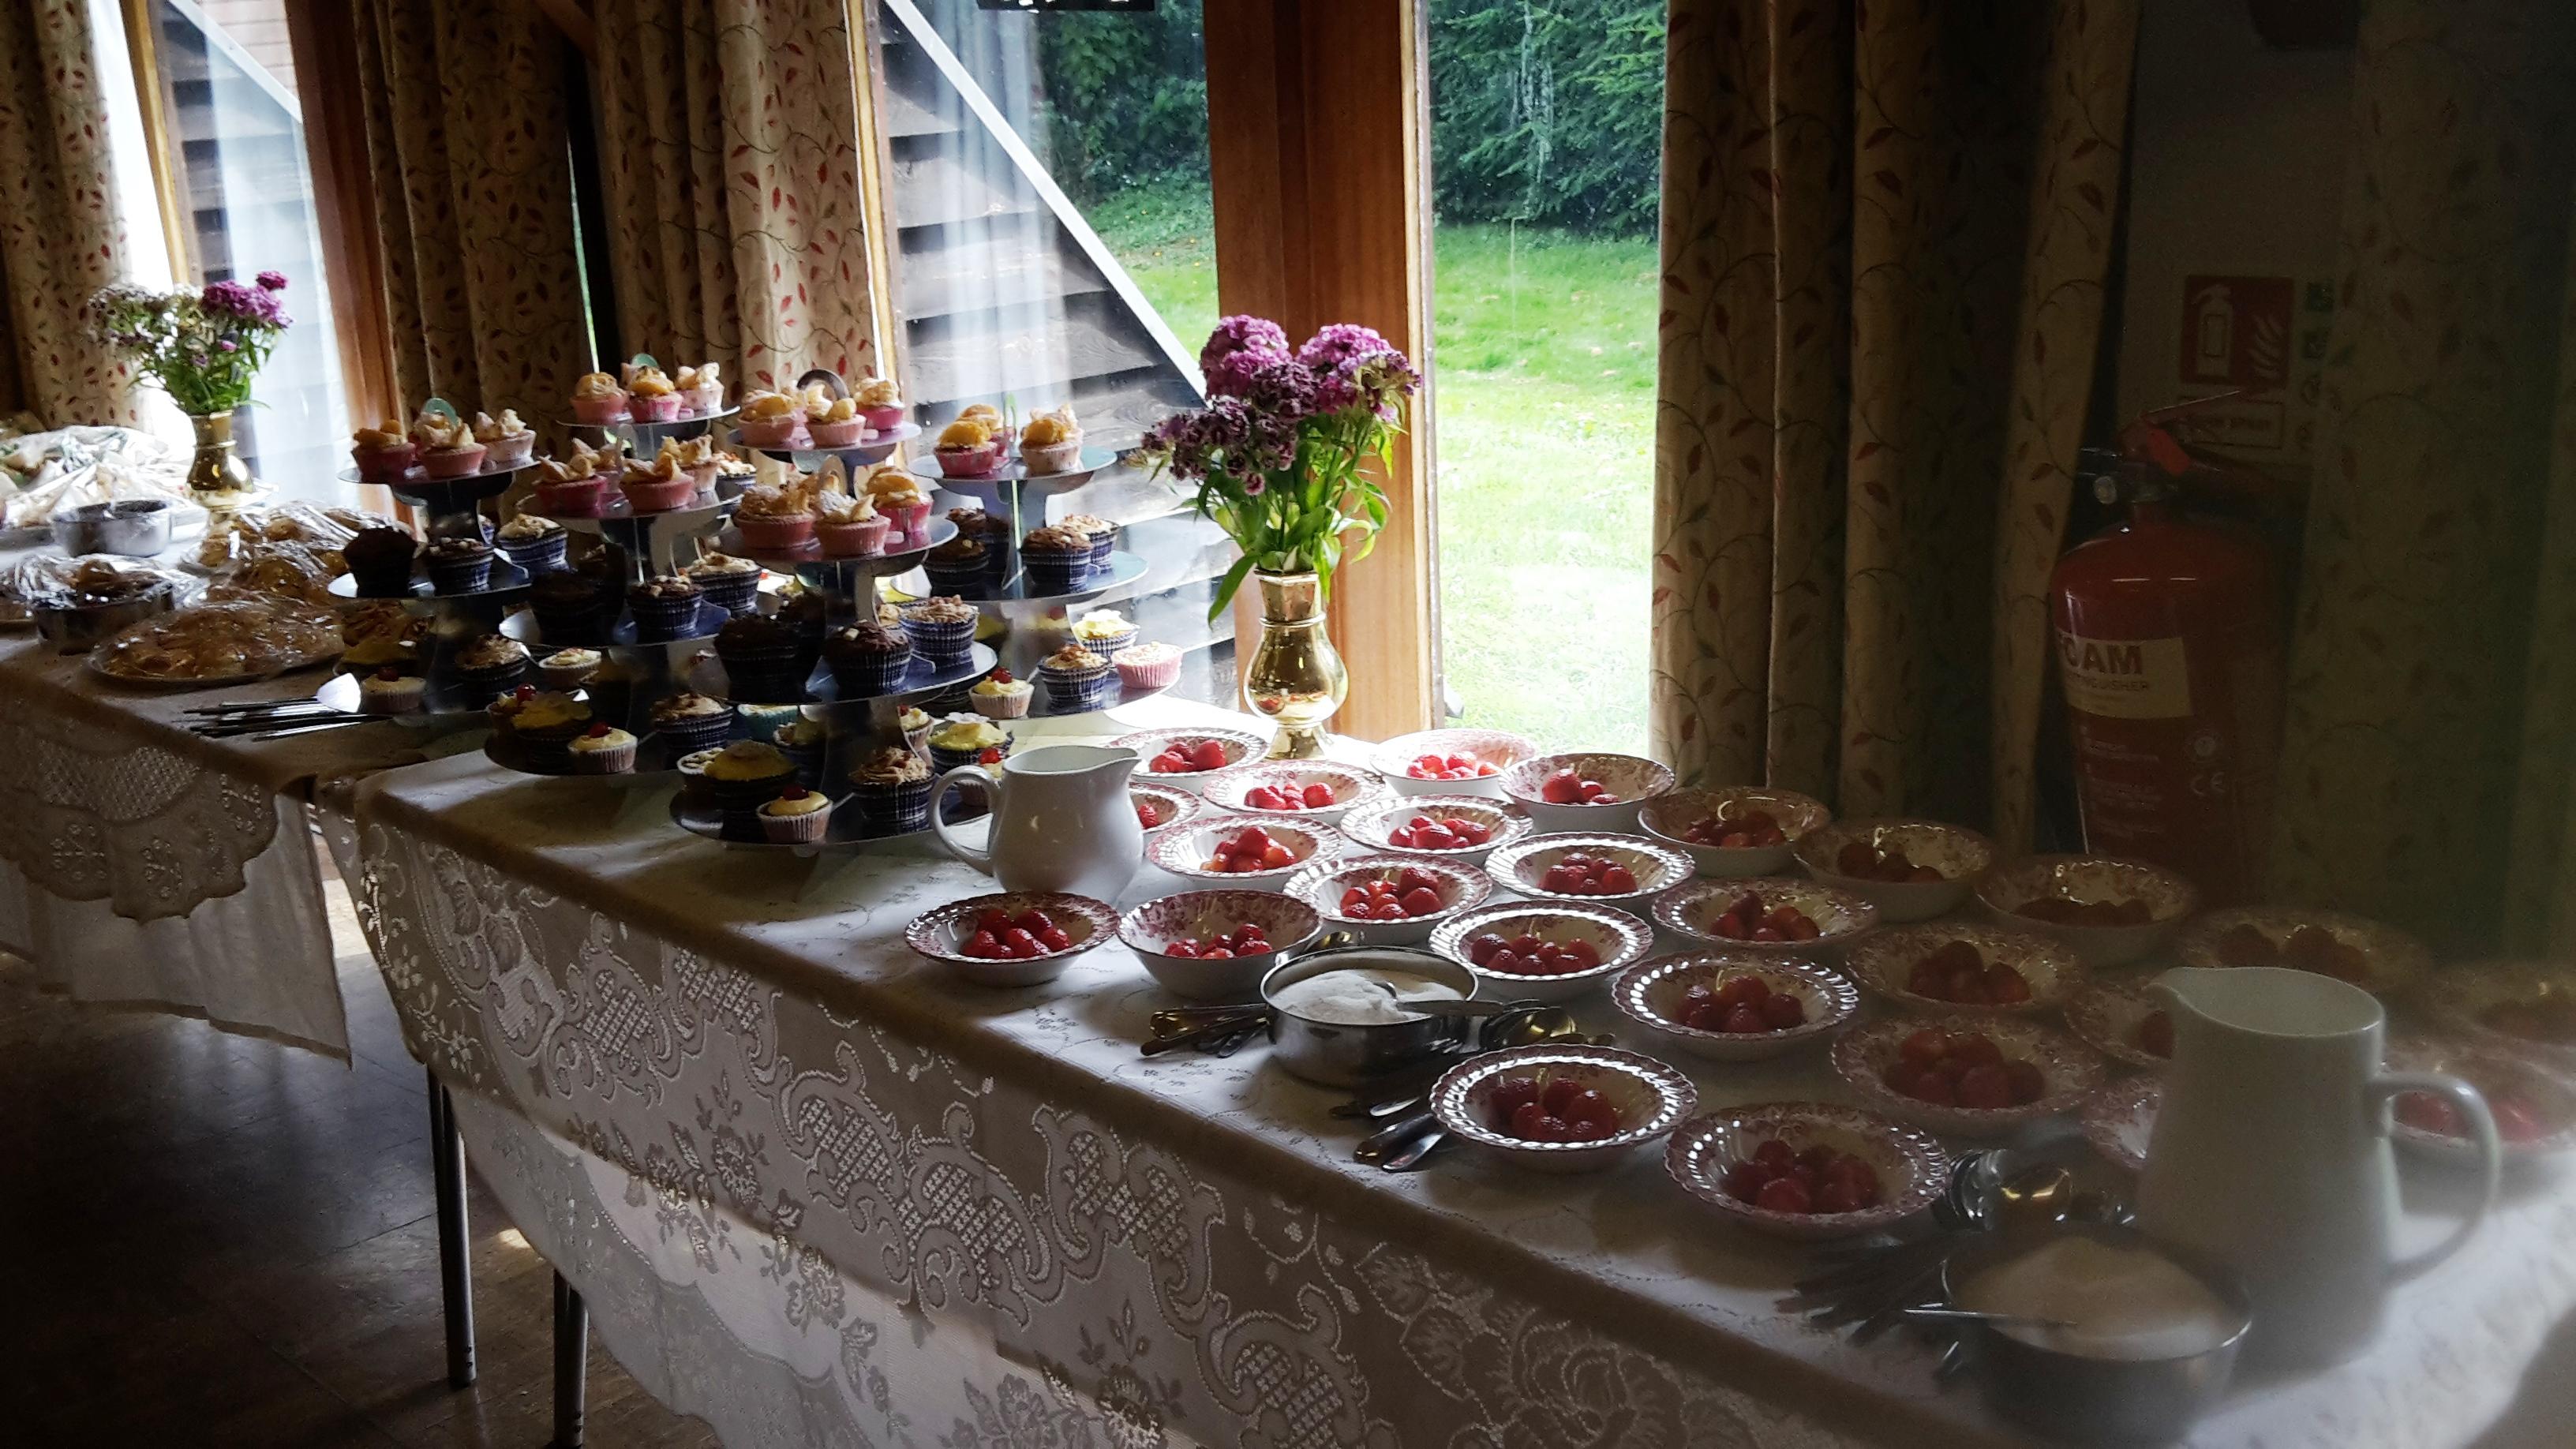 Strawberry Tea - 10 July 2016